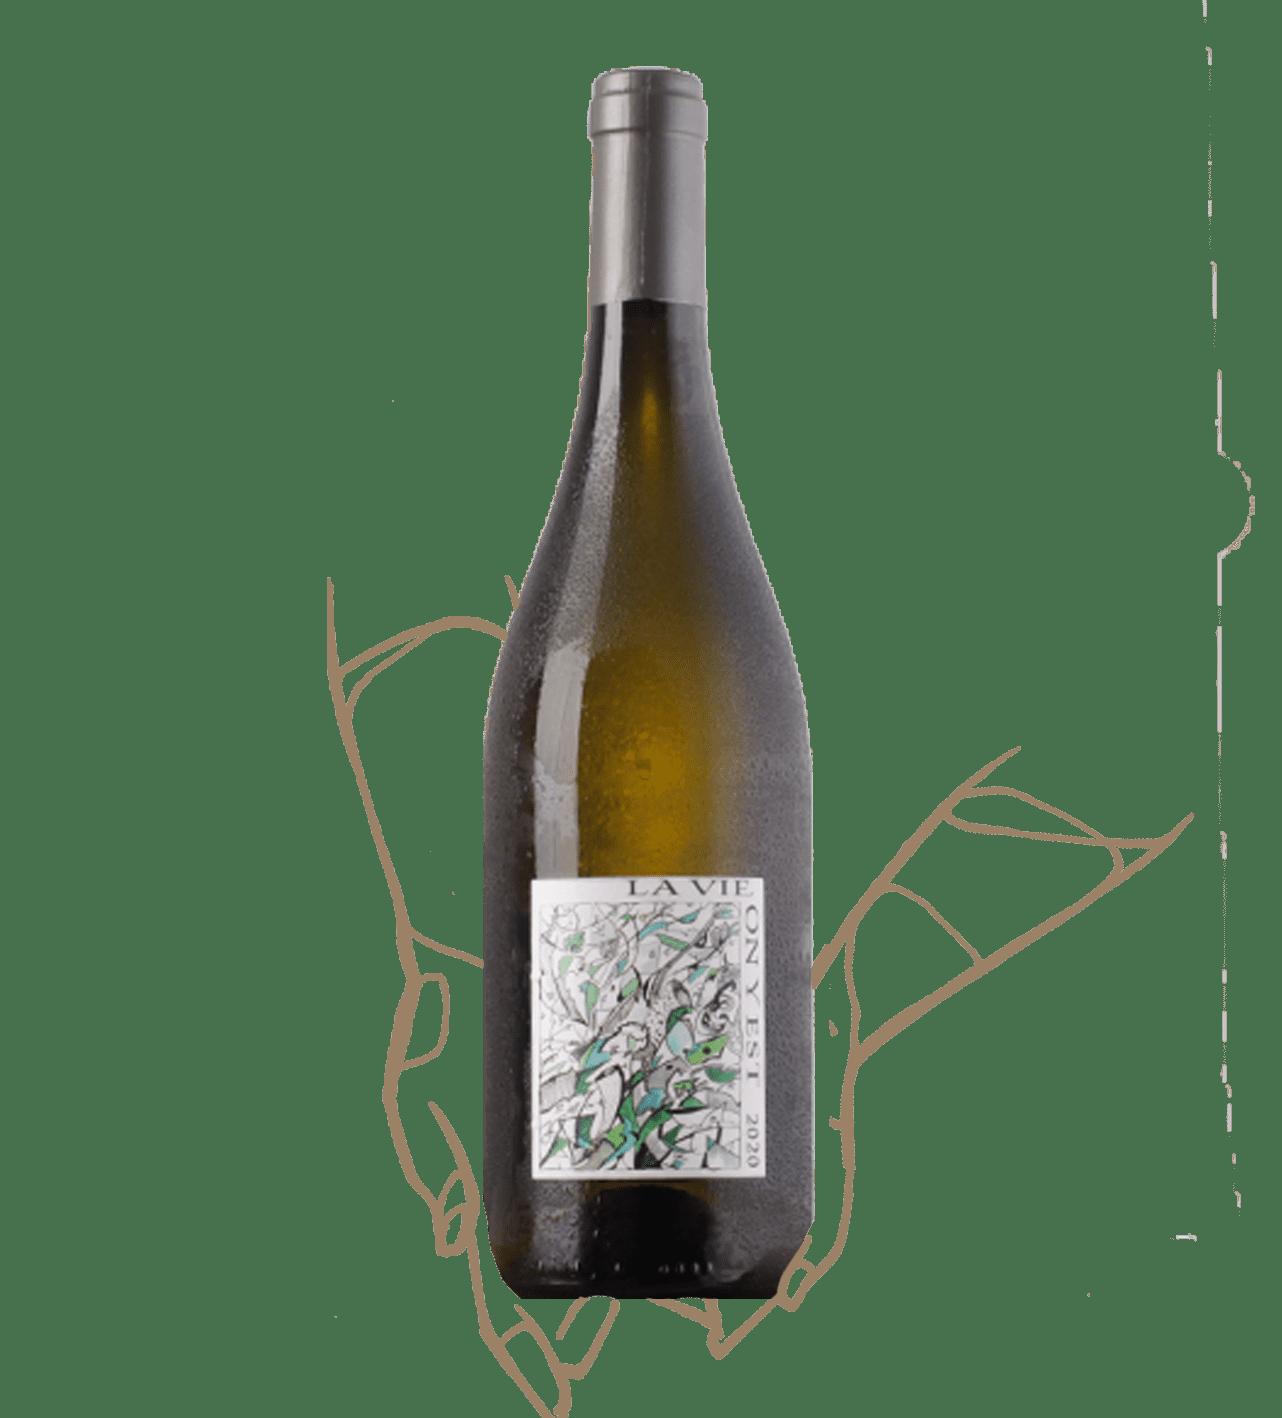 La vie on y est vin naturel de Gramenon